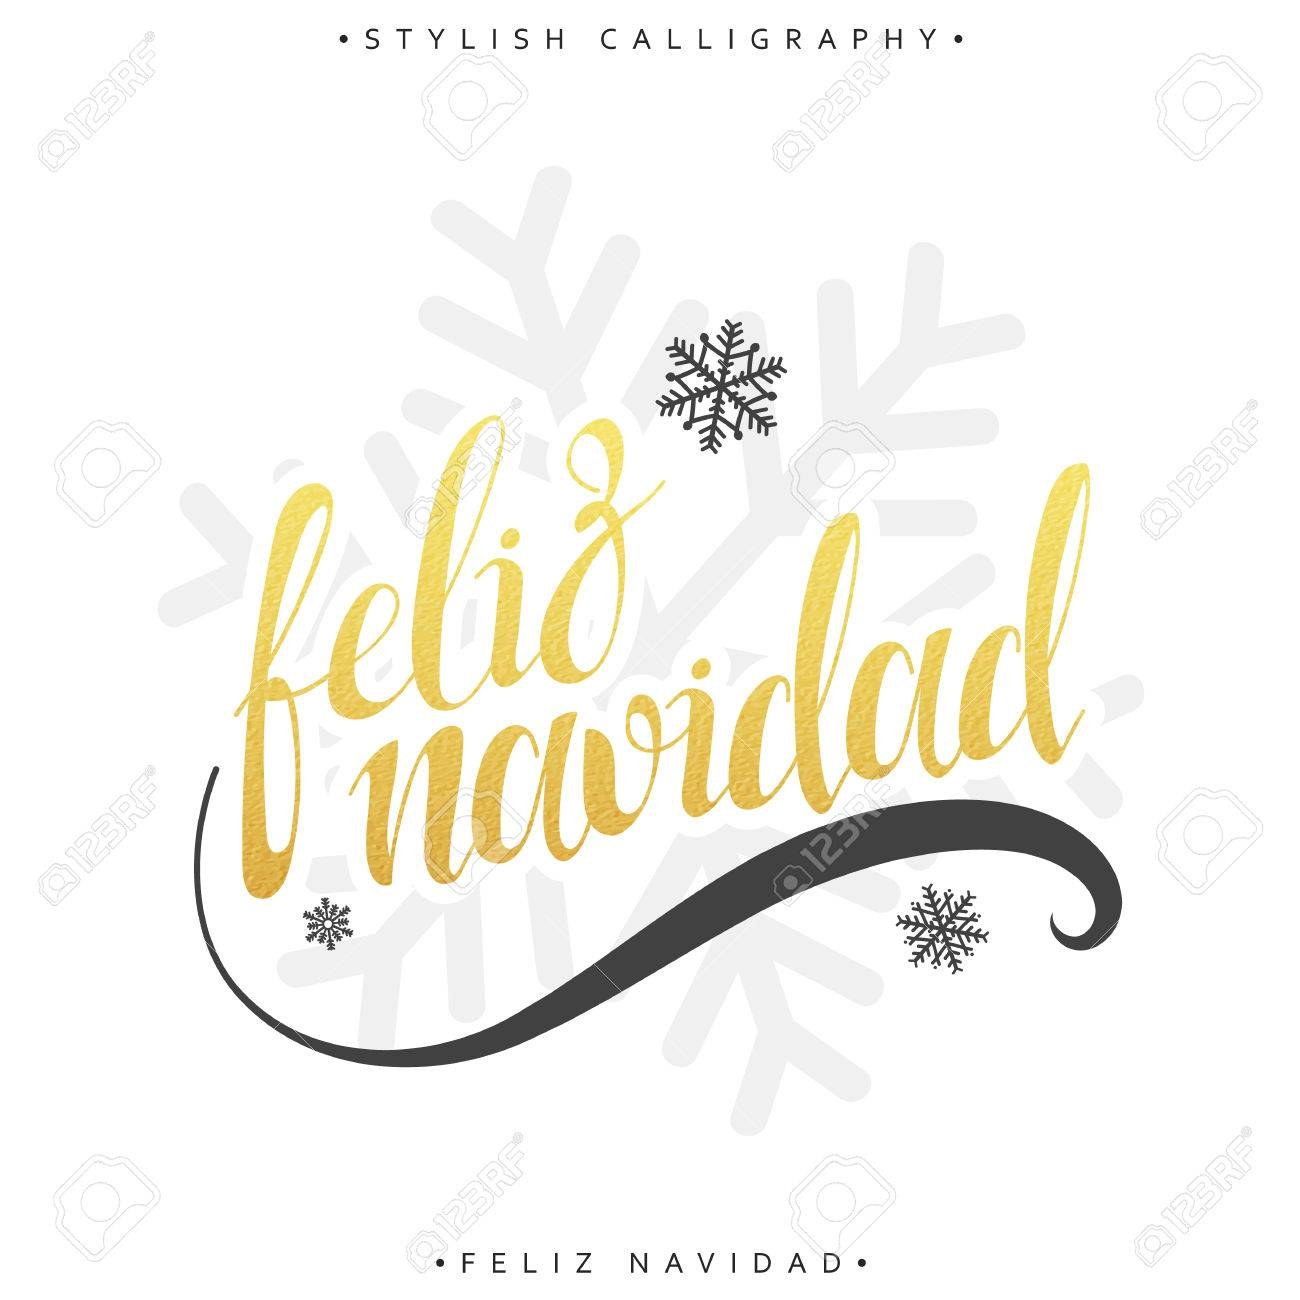 Merry Christmas Card With Greetings In Spanish Language. Feliz ...